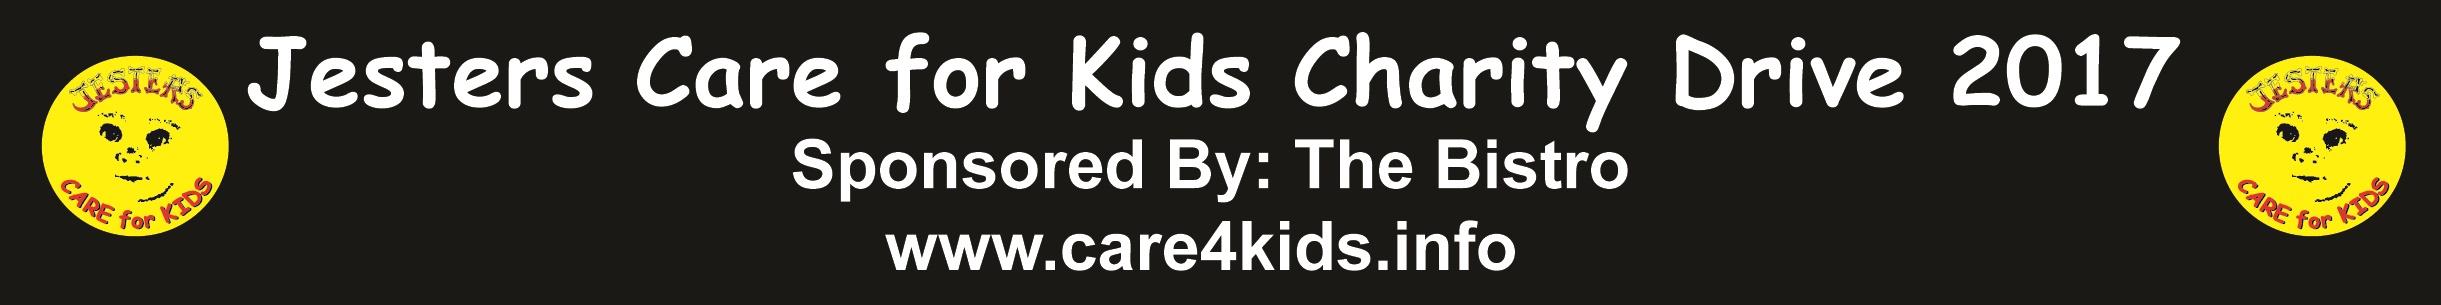 1235-Kids3-PIC3